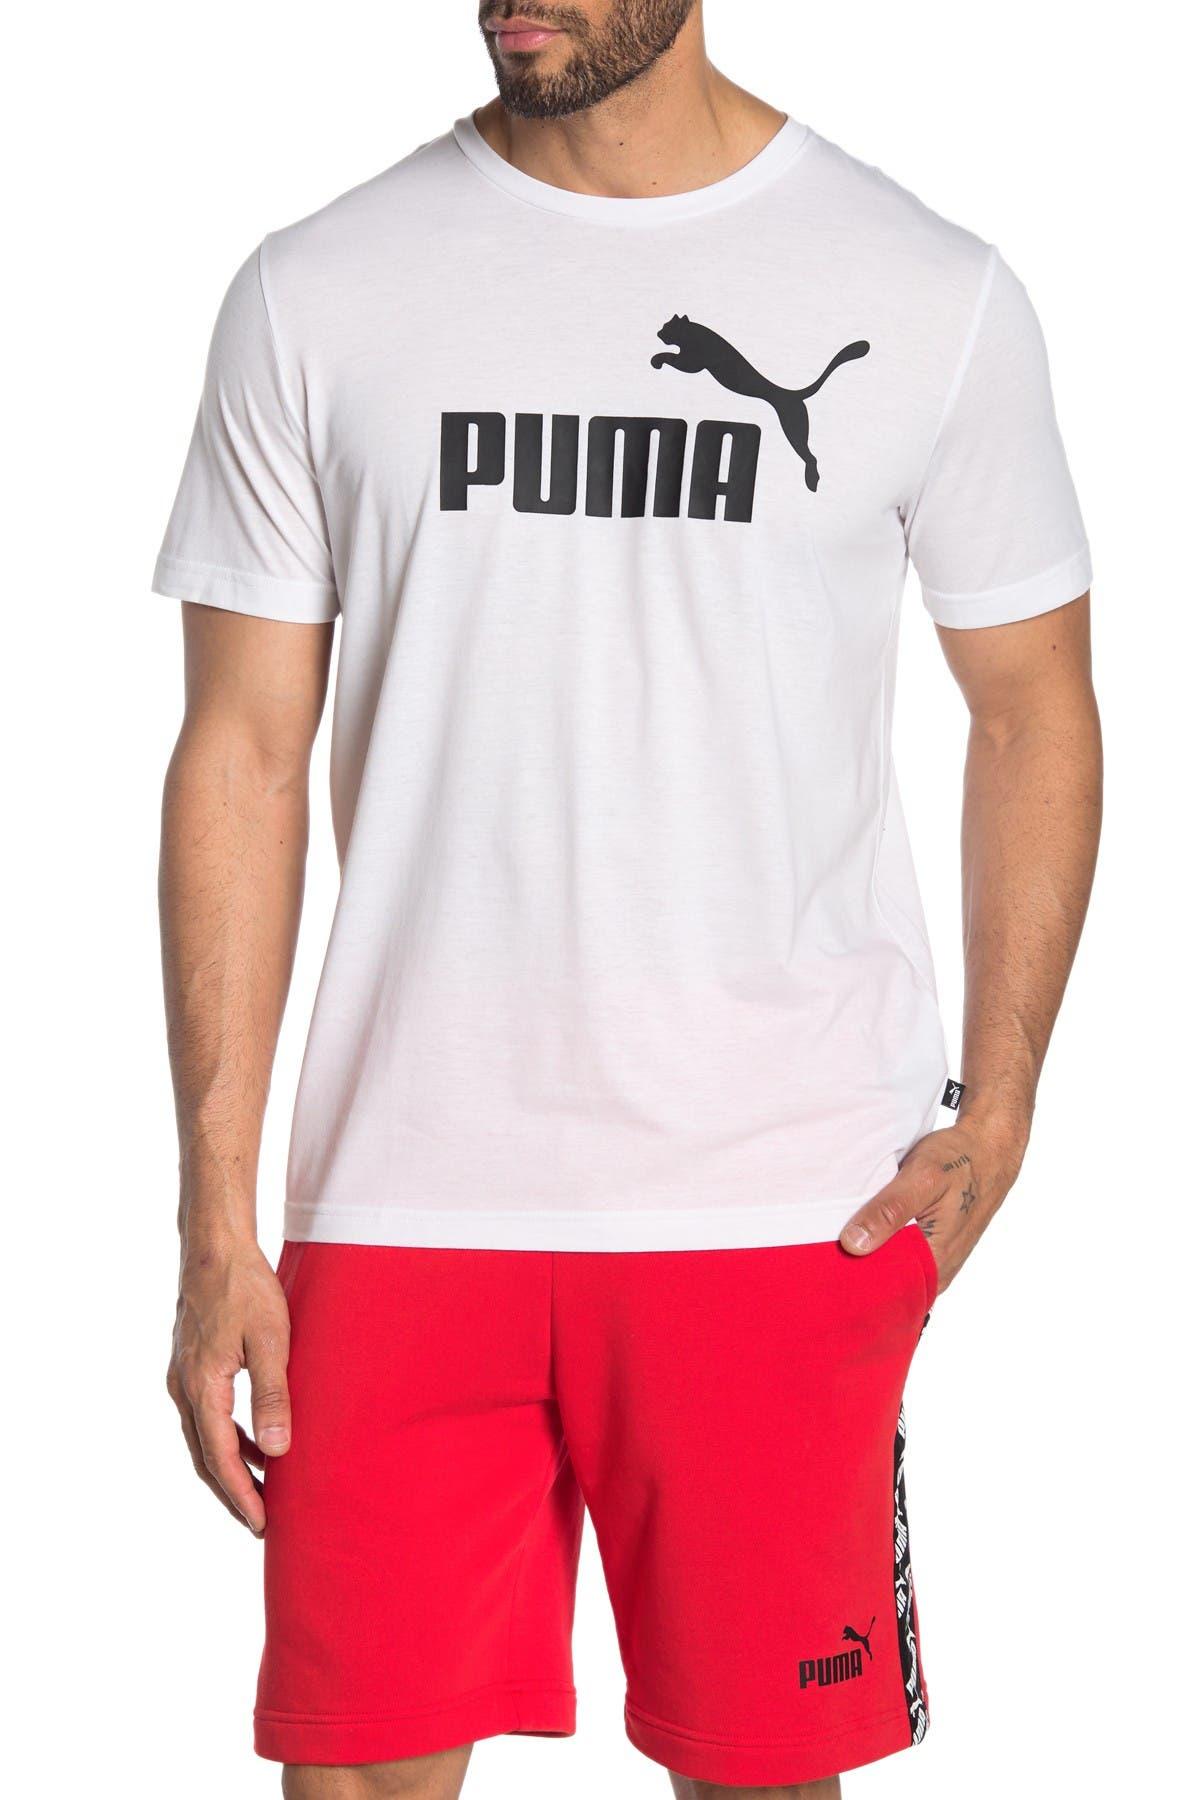 Image of PUMA Essentials+ Heather Brand Logo T-Shirt